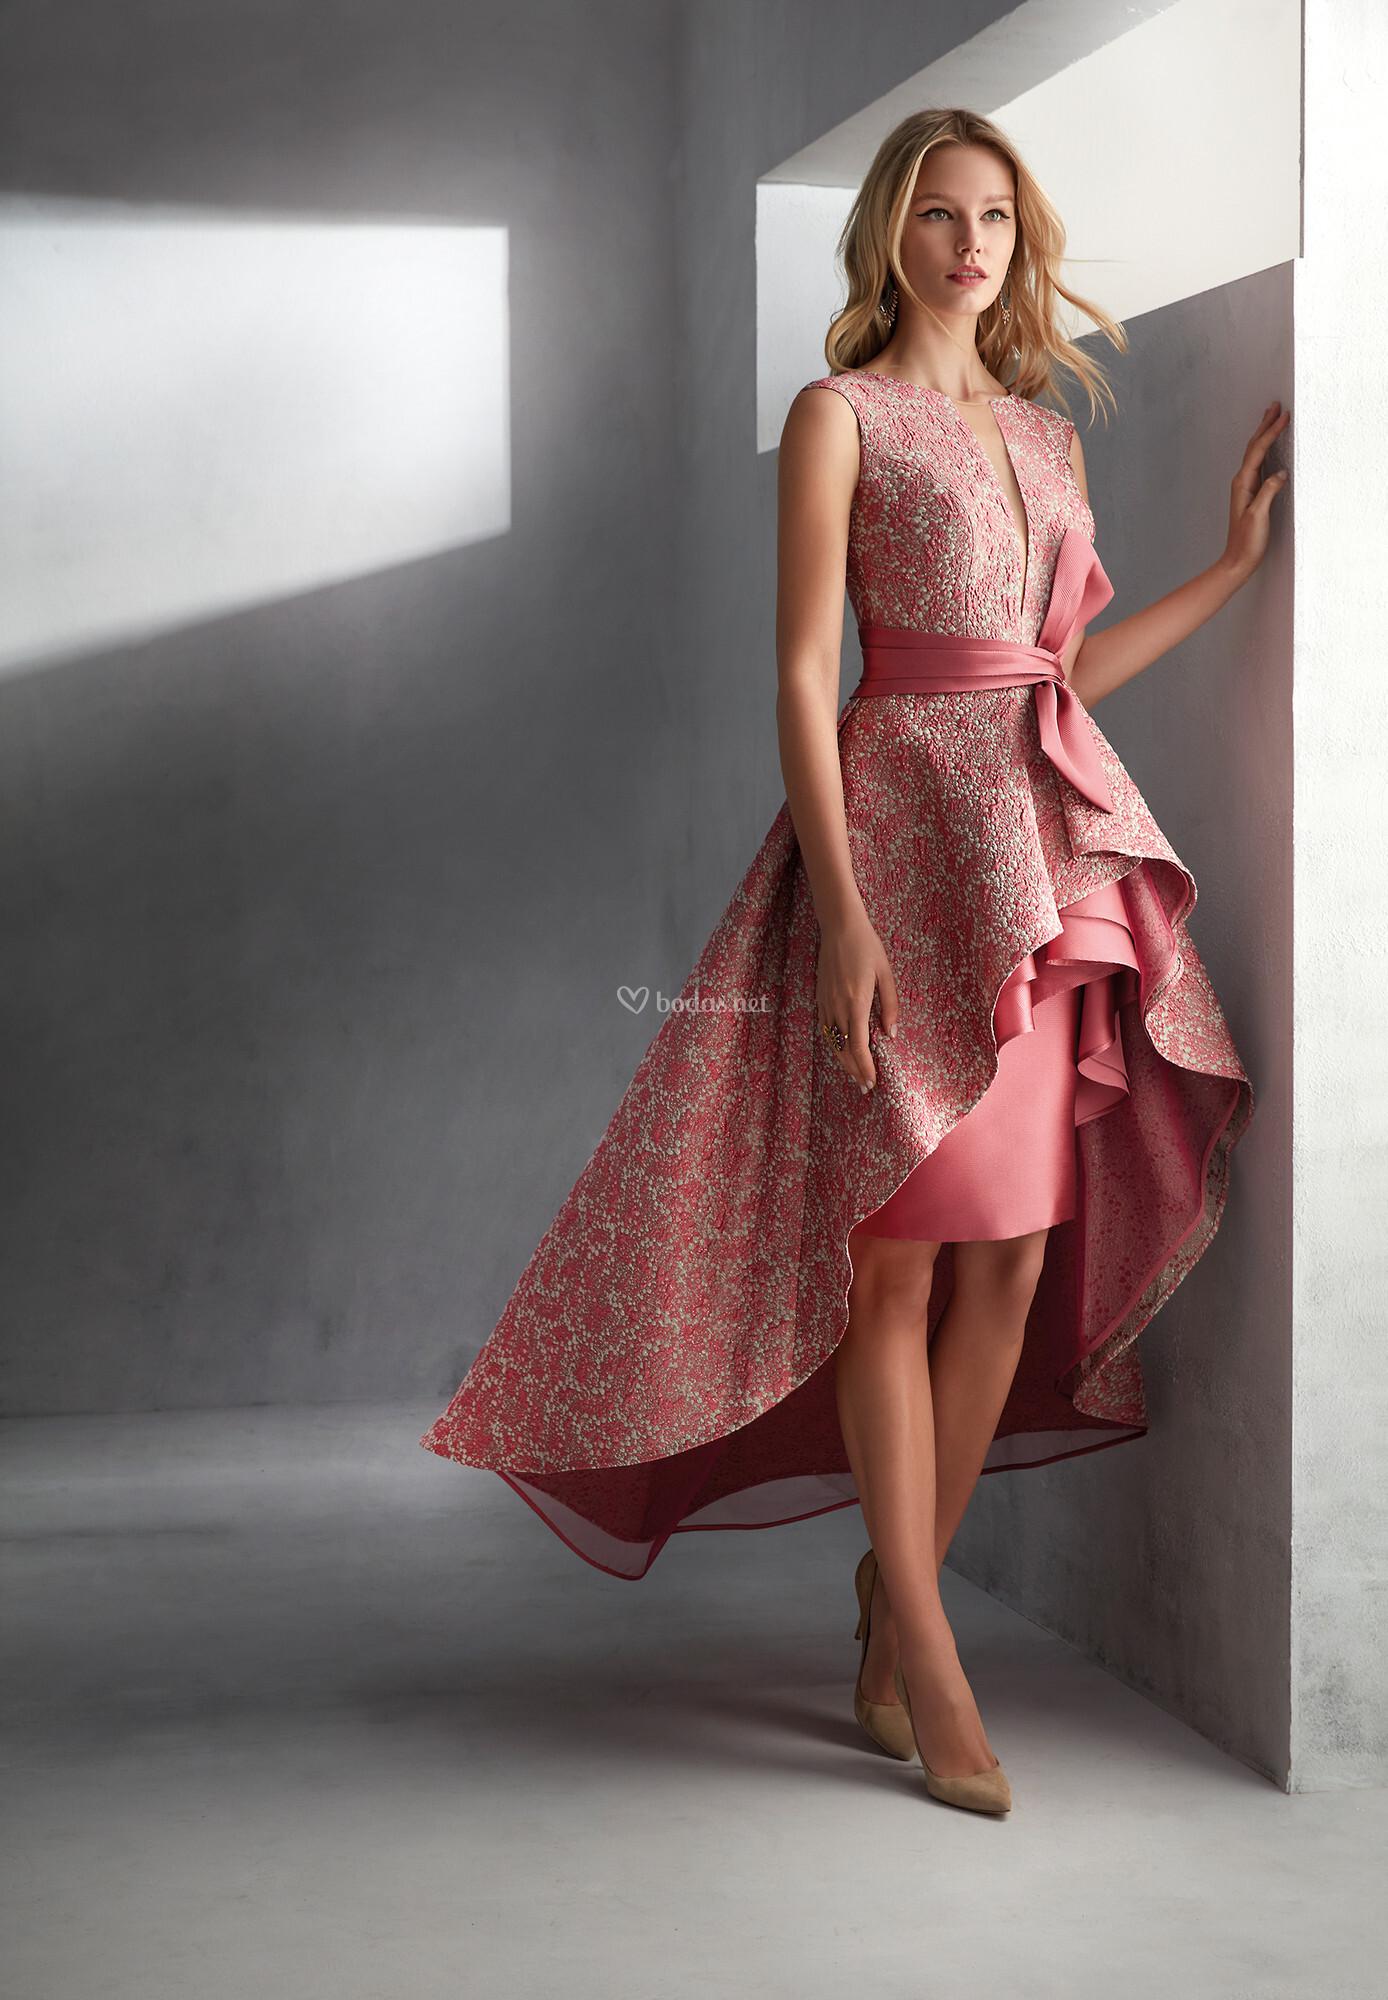 Vestidos madrina boda cortos